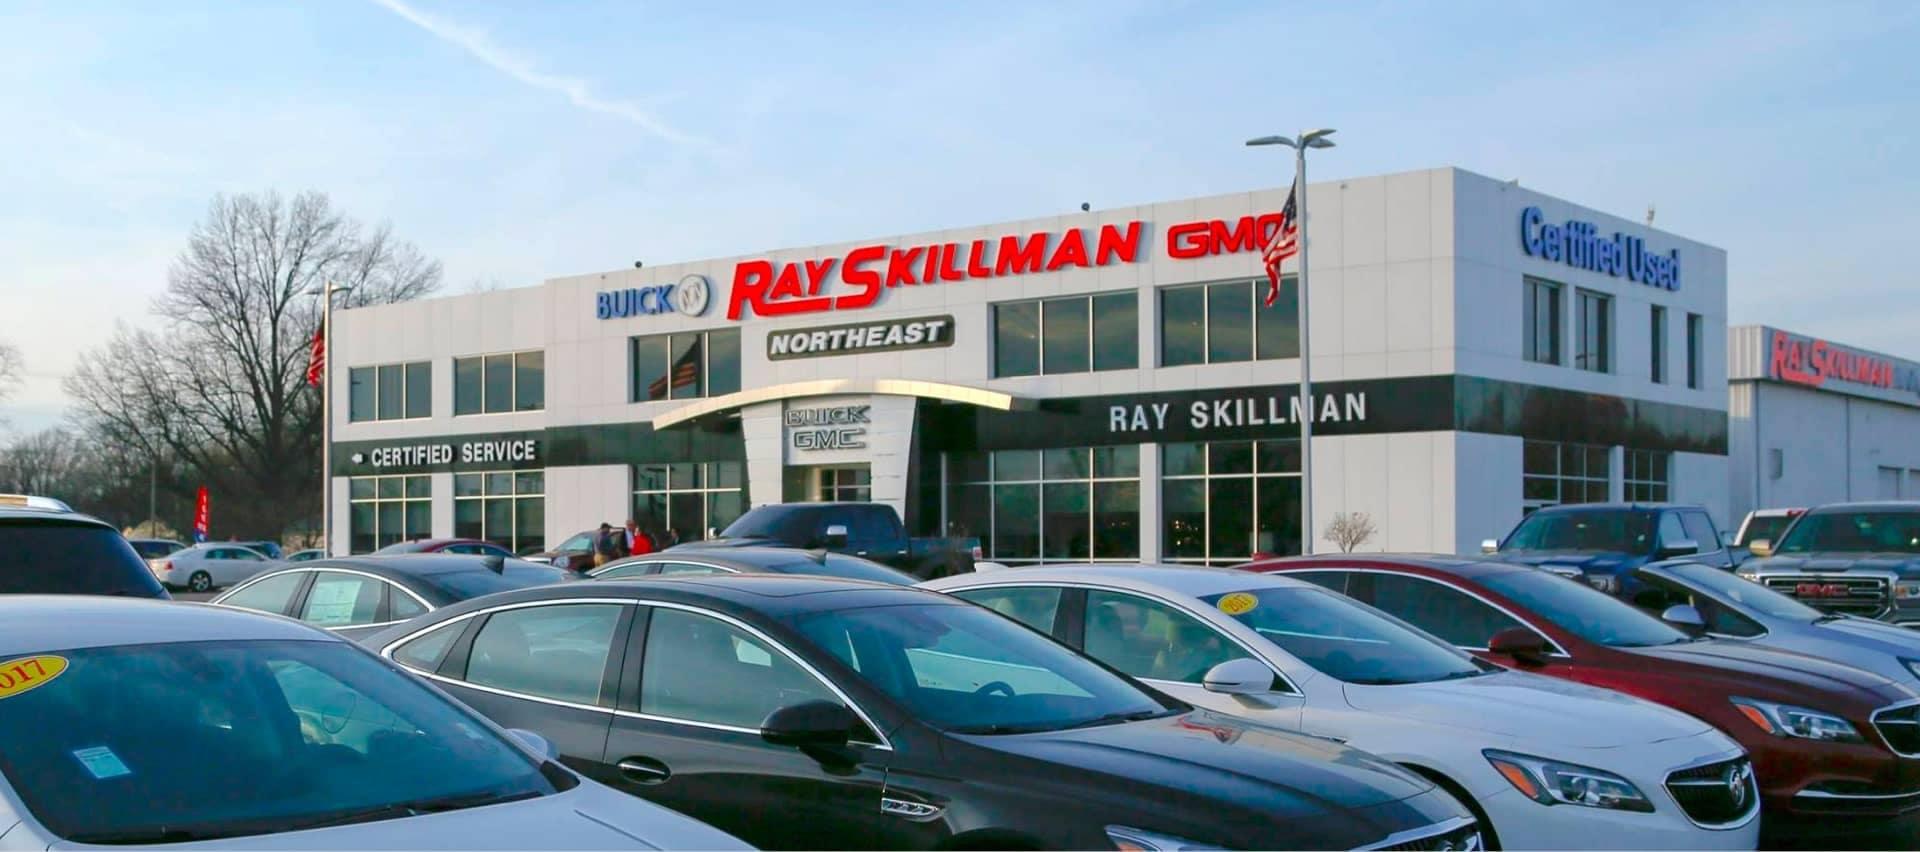 Ray Skillman Buick GMC dealership exterior